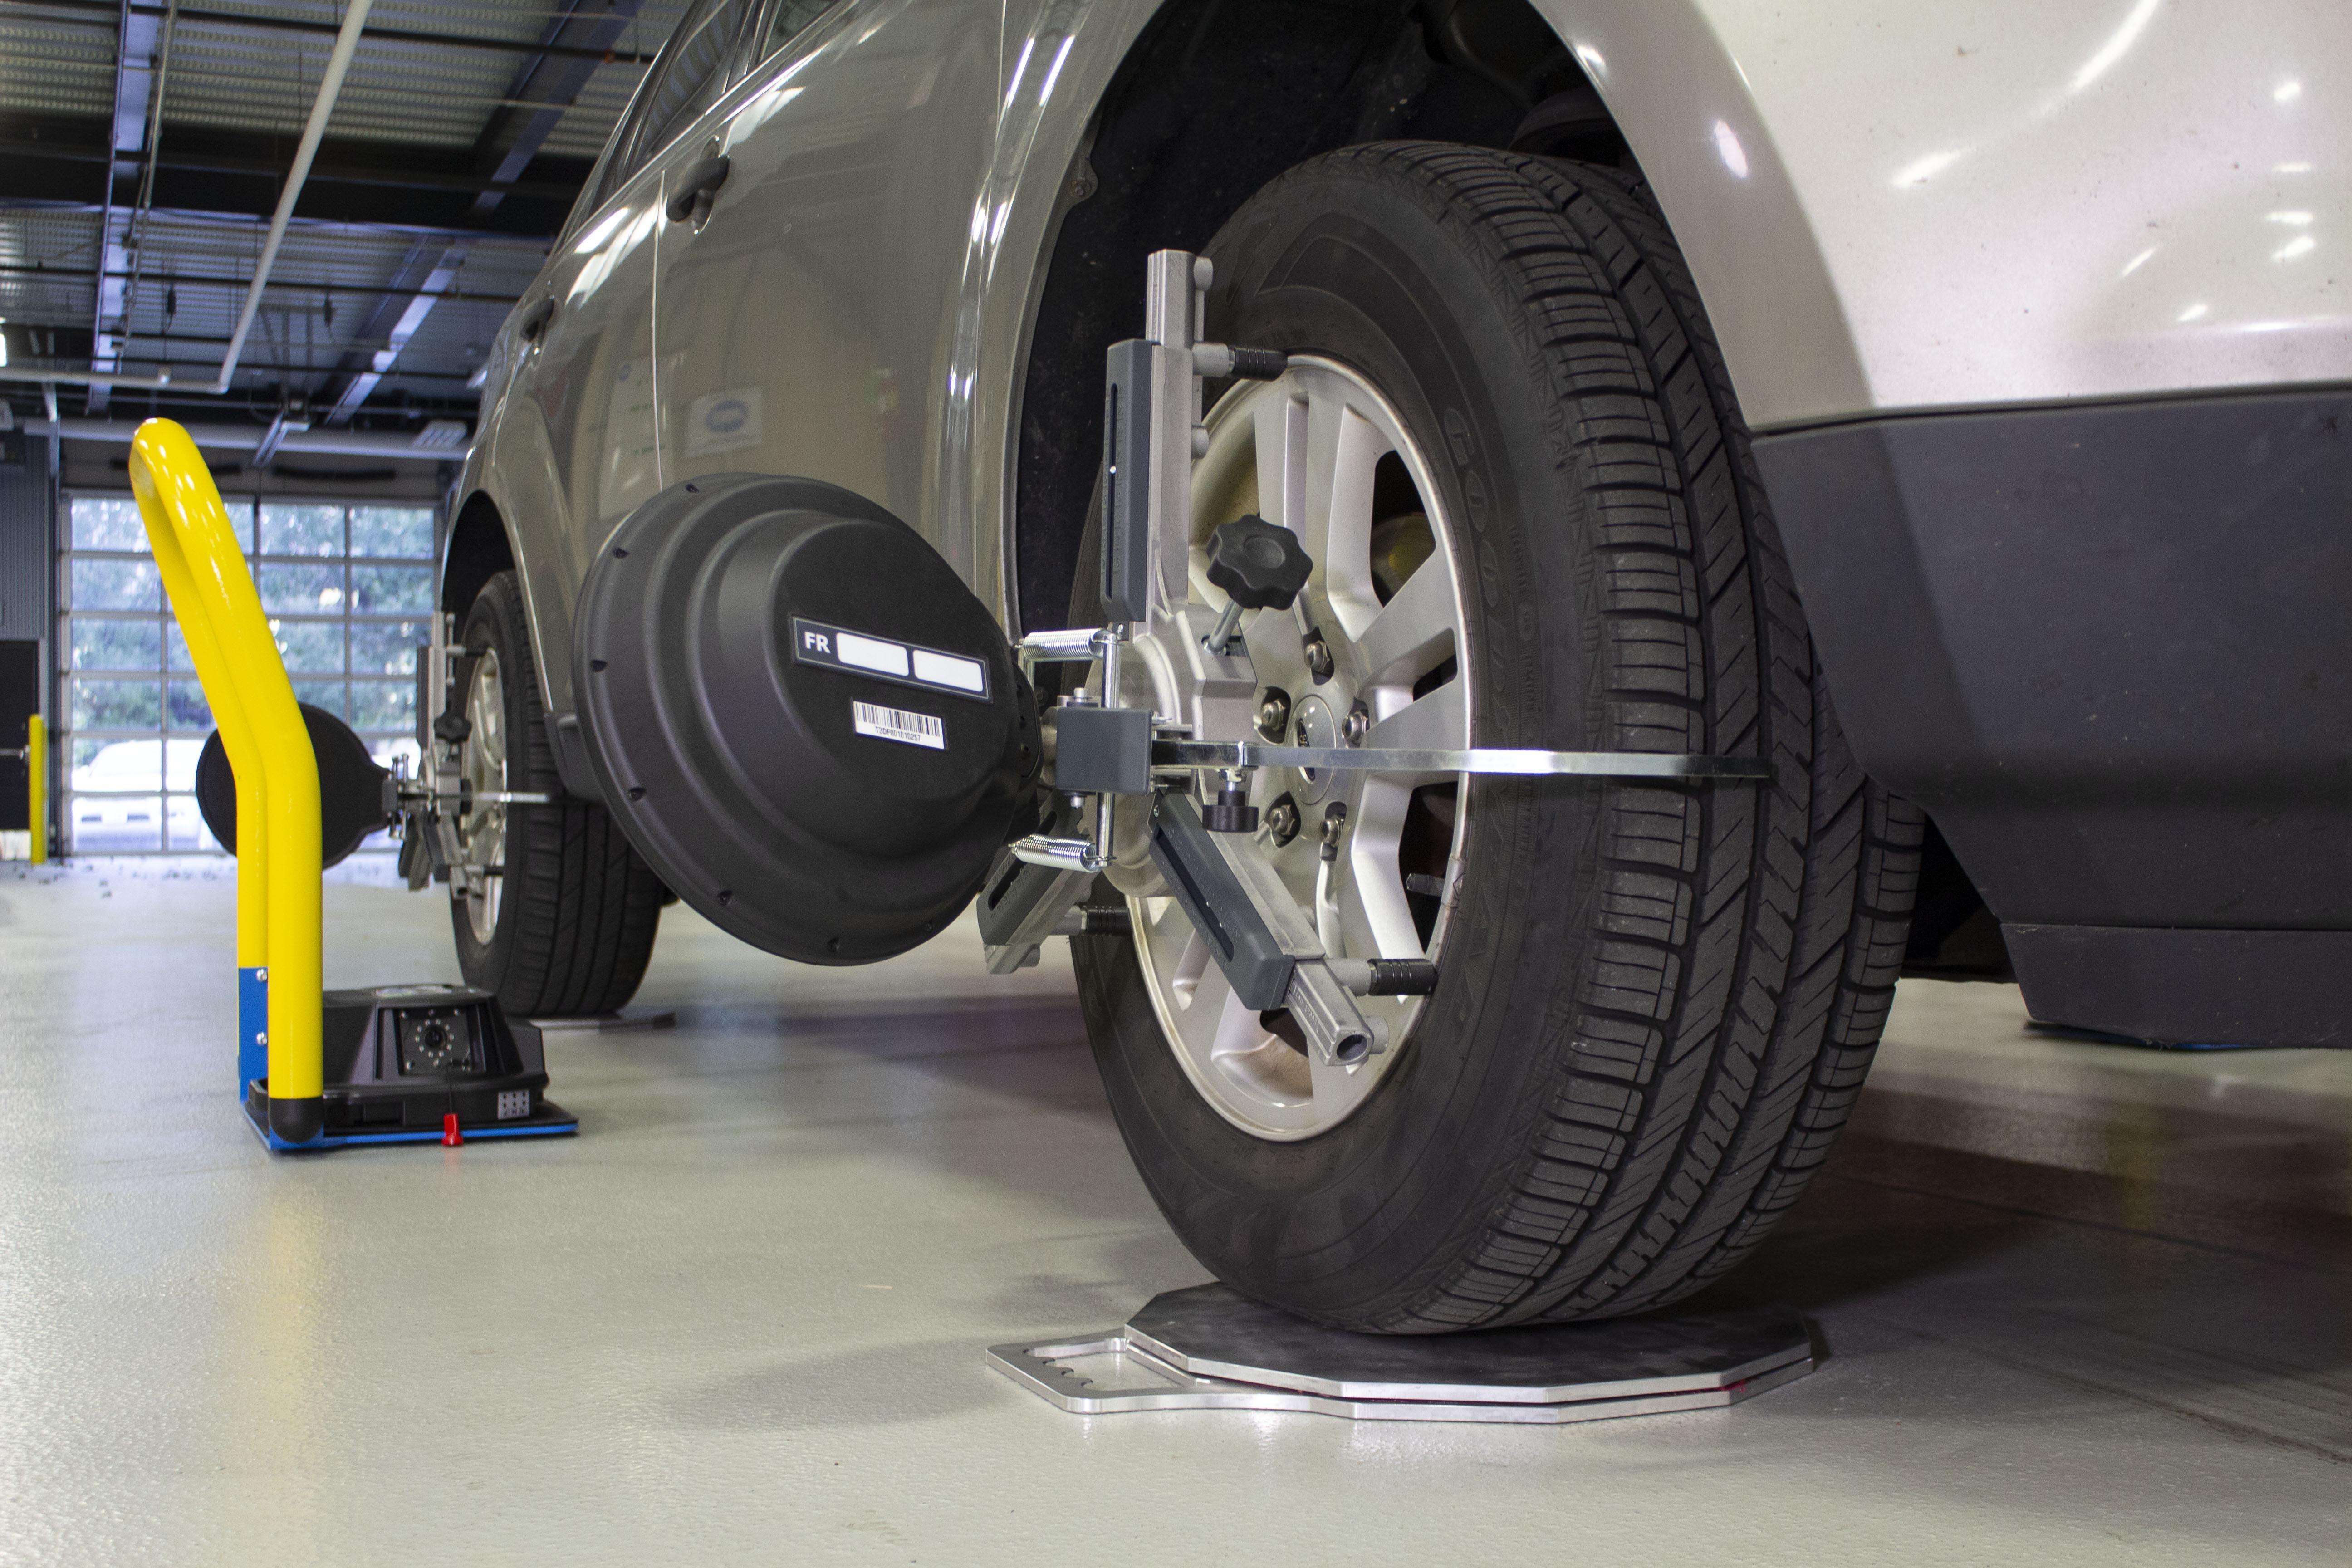 Rotary wheel service alignment equipment